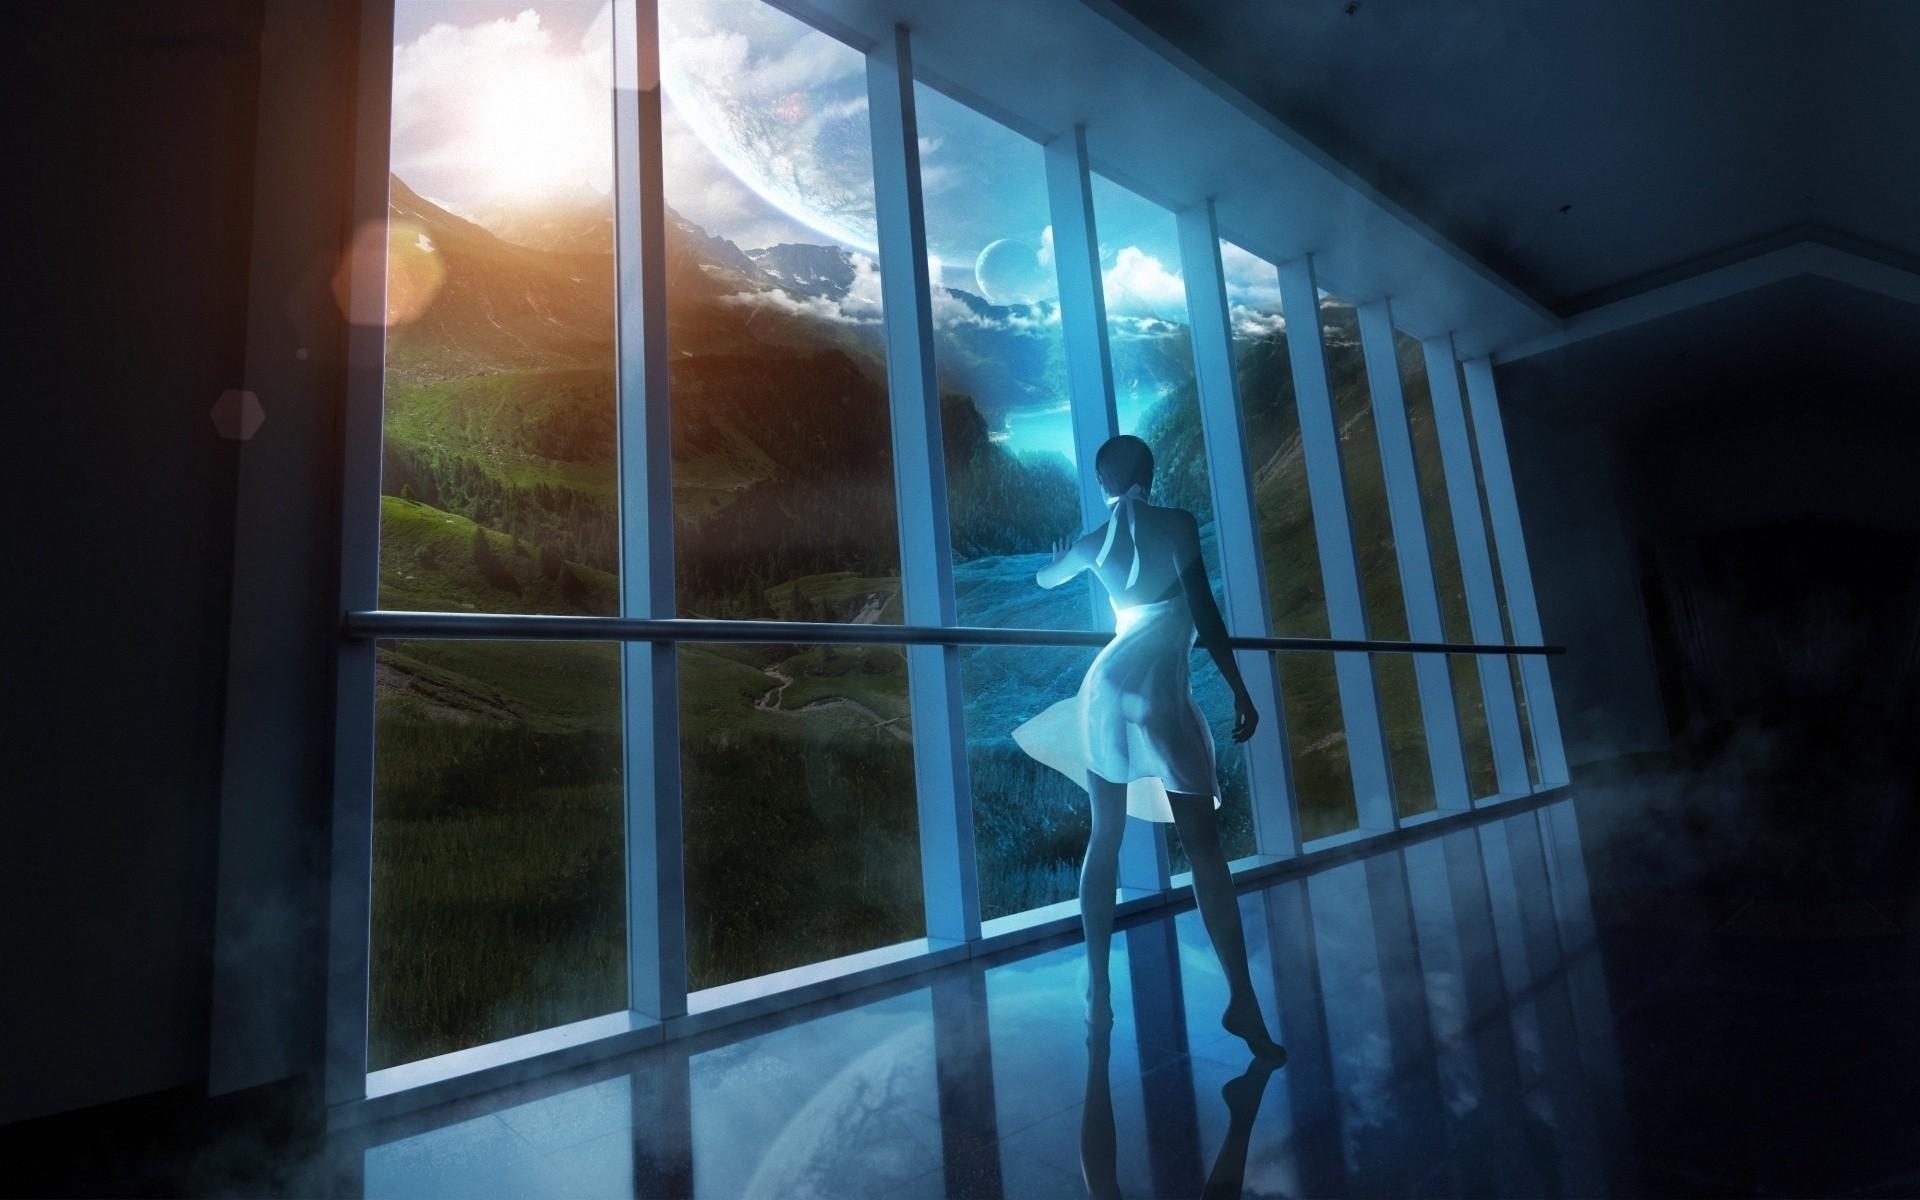 Women Outer Space Fantasy Art Artwork Wallpaper At 3d Wallpapers